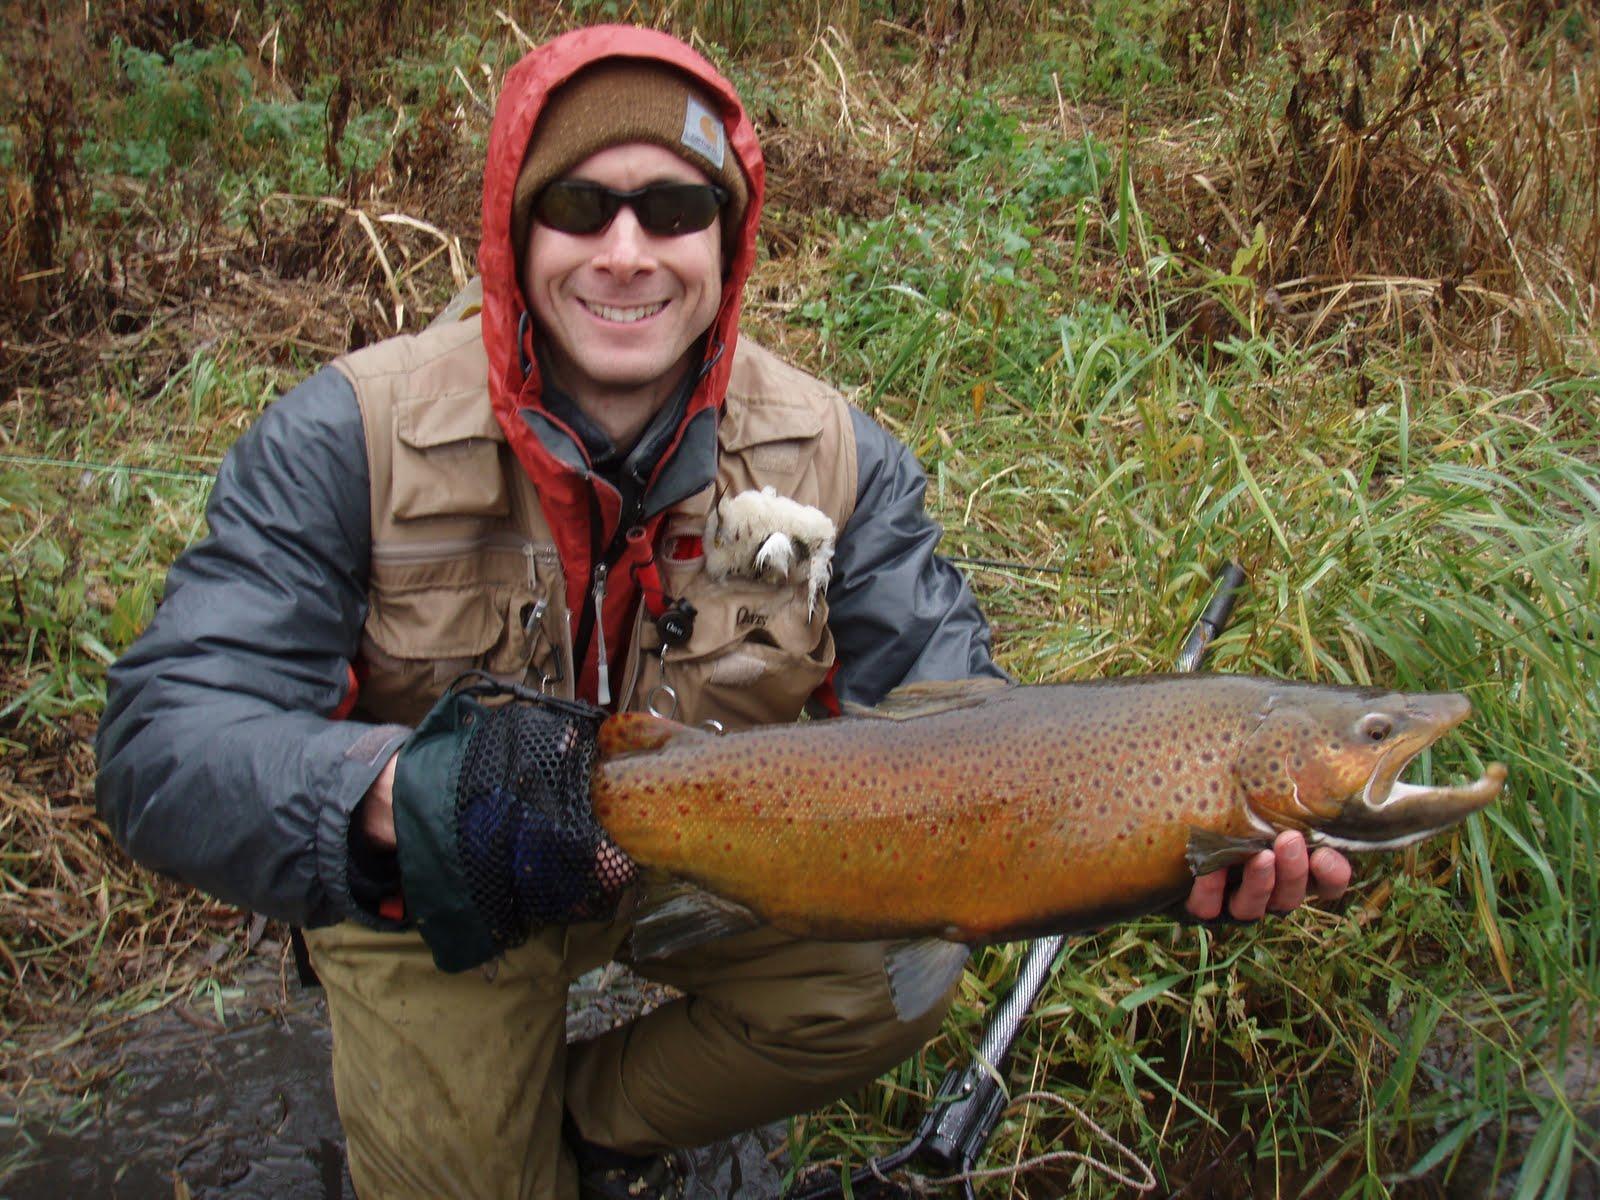 Jay peck 39 s blog november 2010 for Oak orchard fishing report